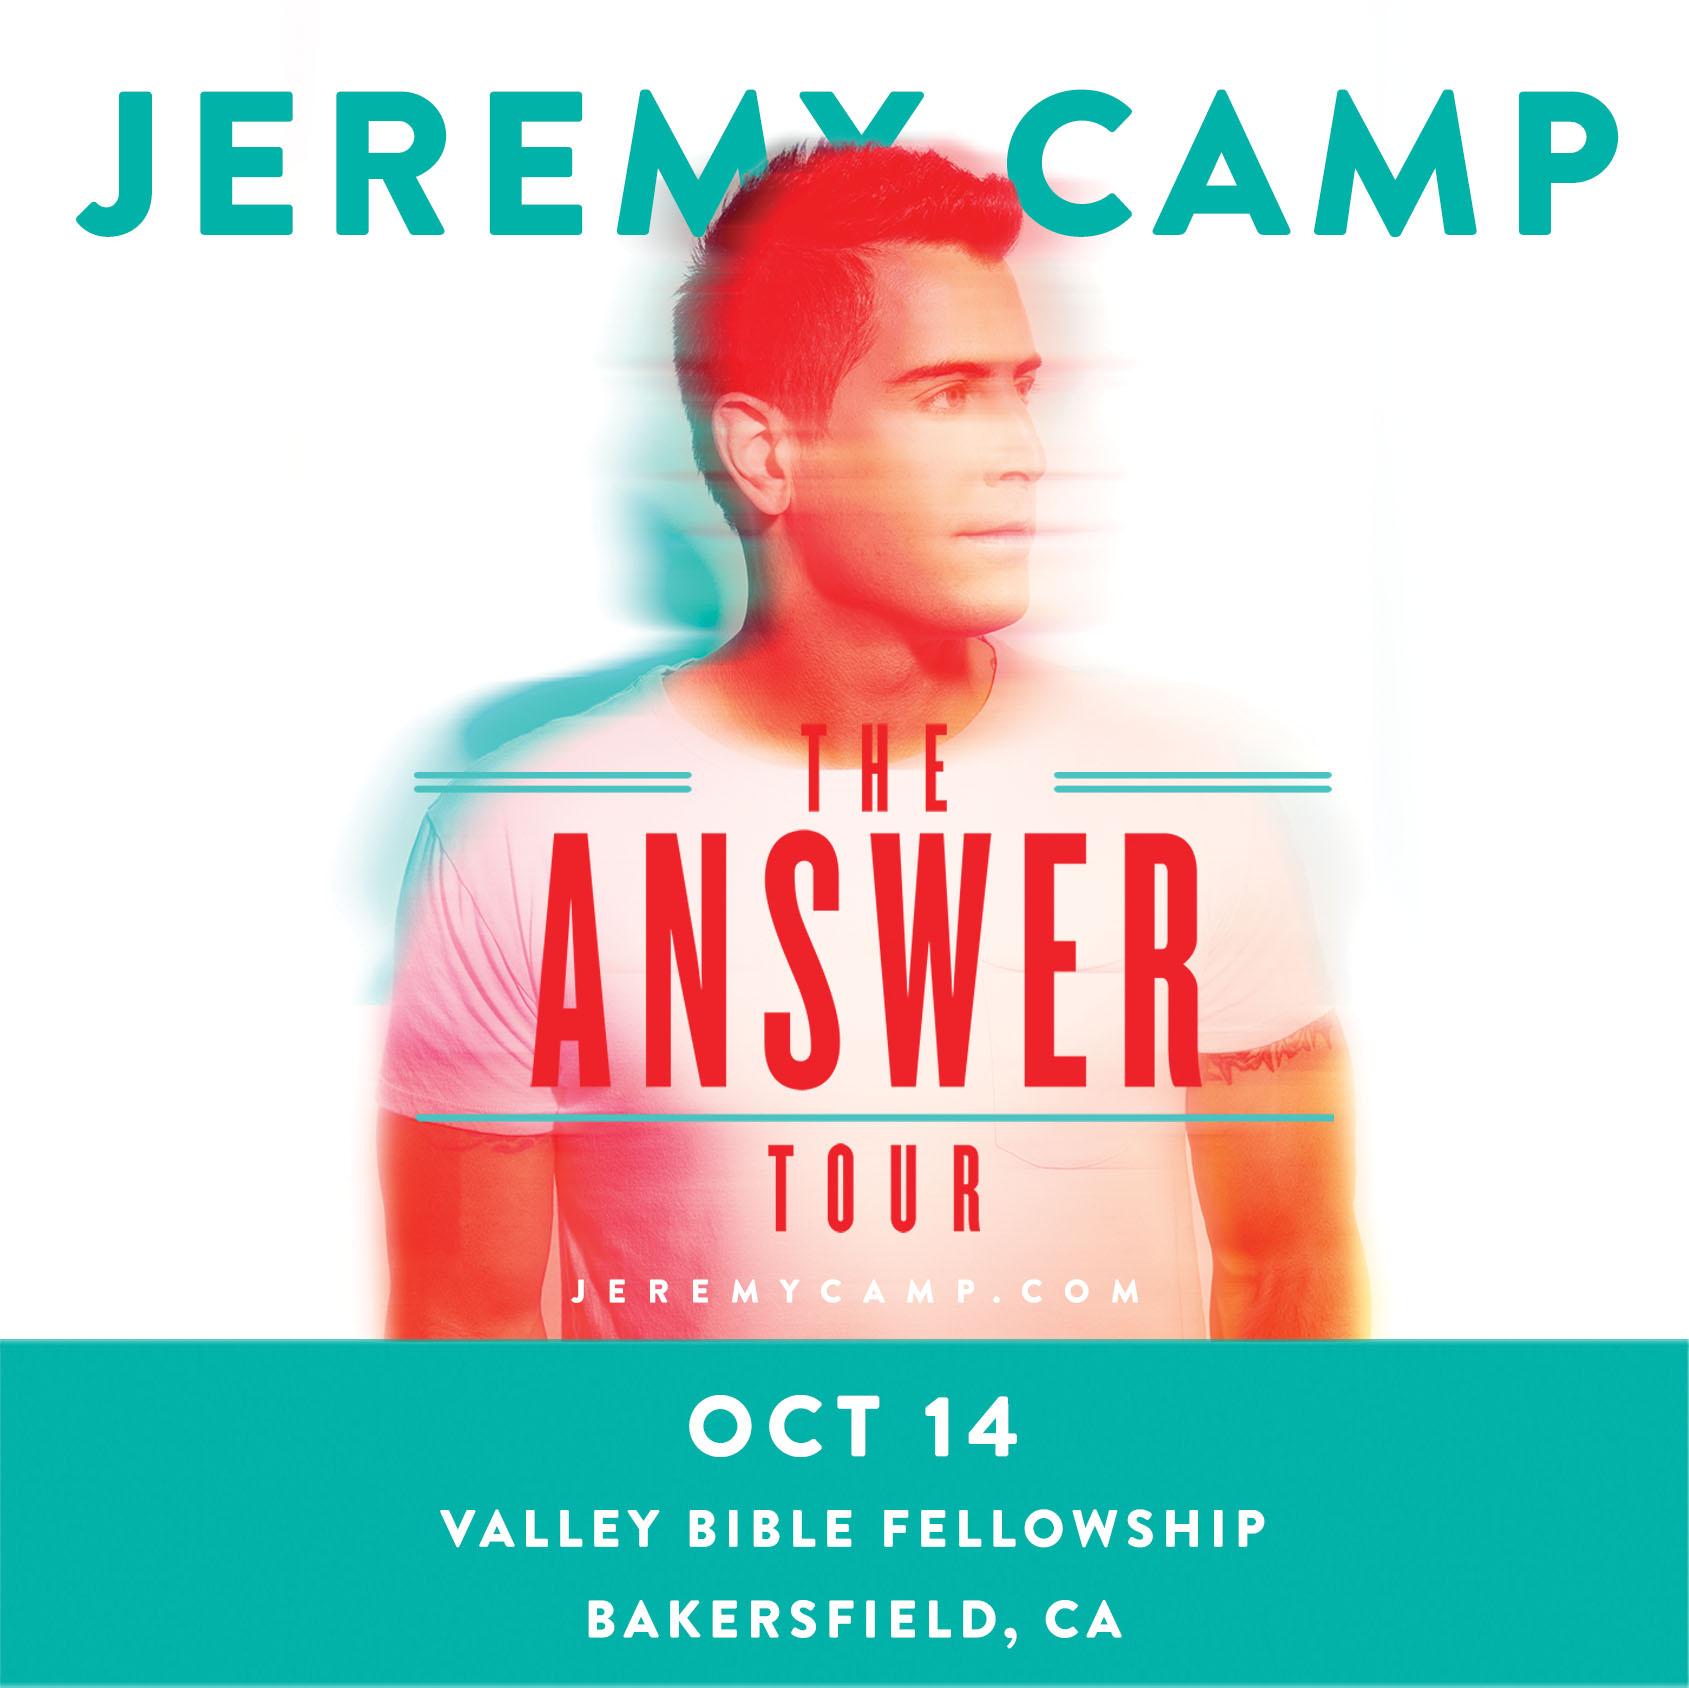 Jeremy Camp Concert Oct 14!